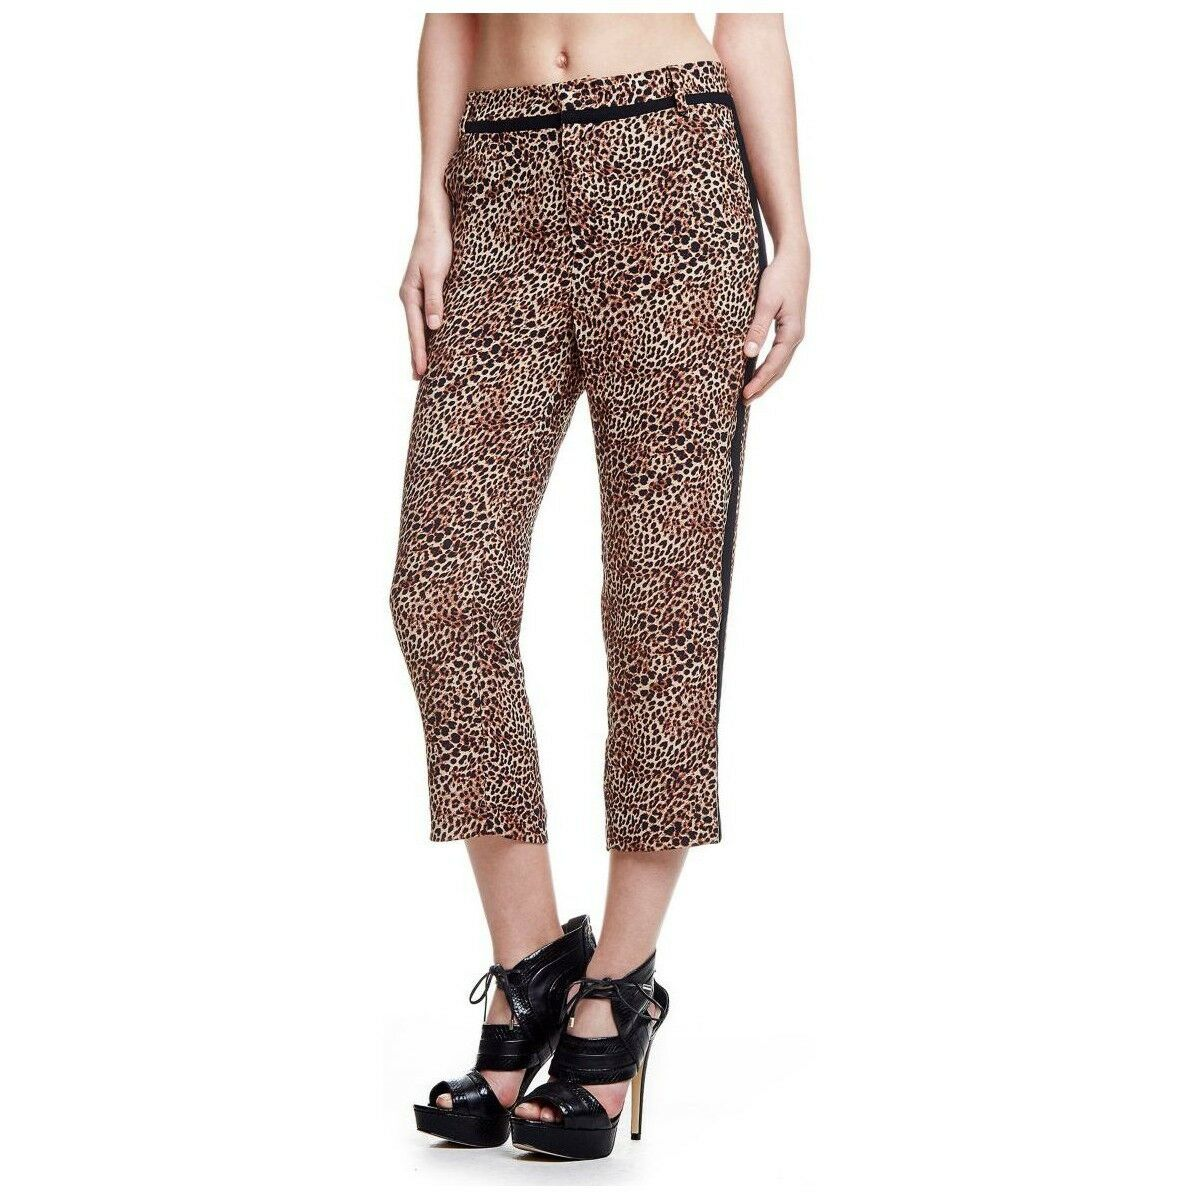 Solde- pantalon à motifs animaliers GUESS   W61B05W7700 - en 38 40 (us= 28- L=N)